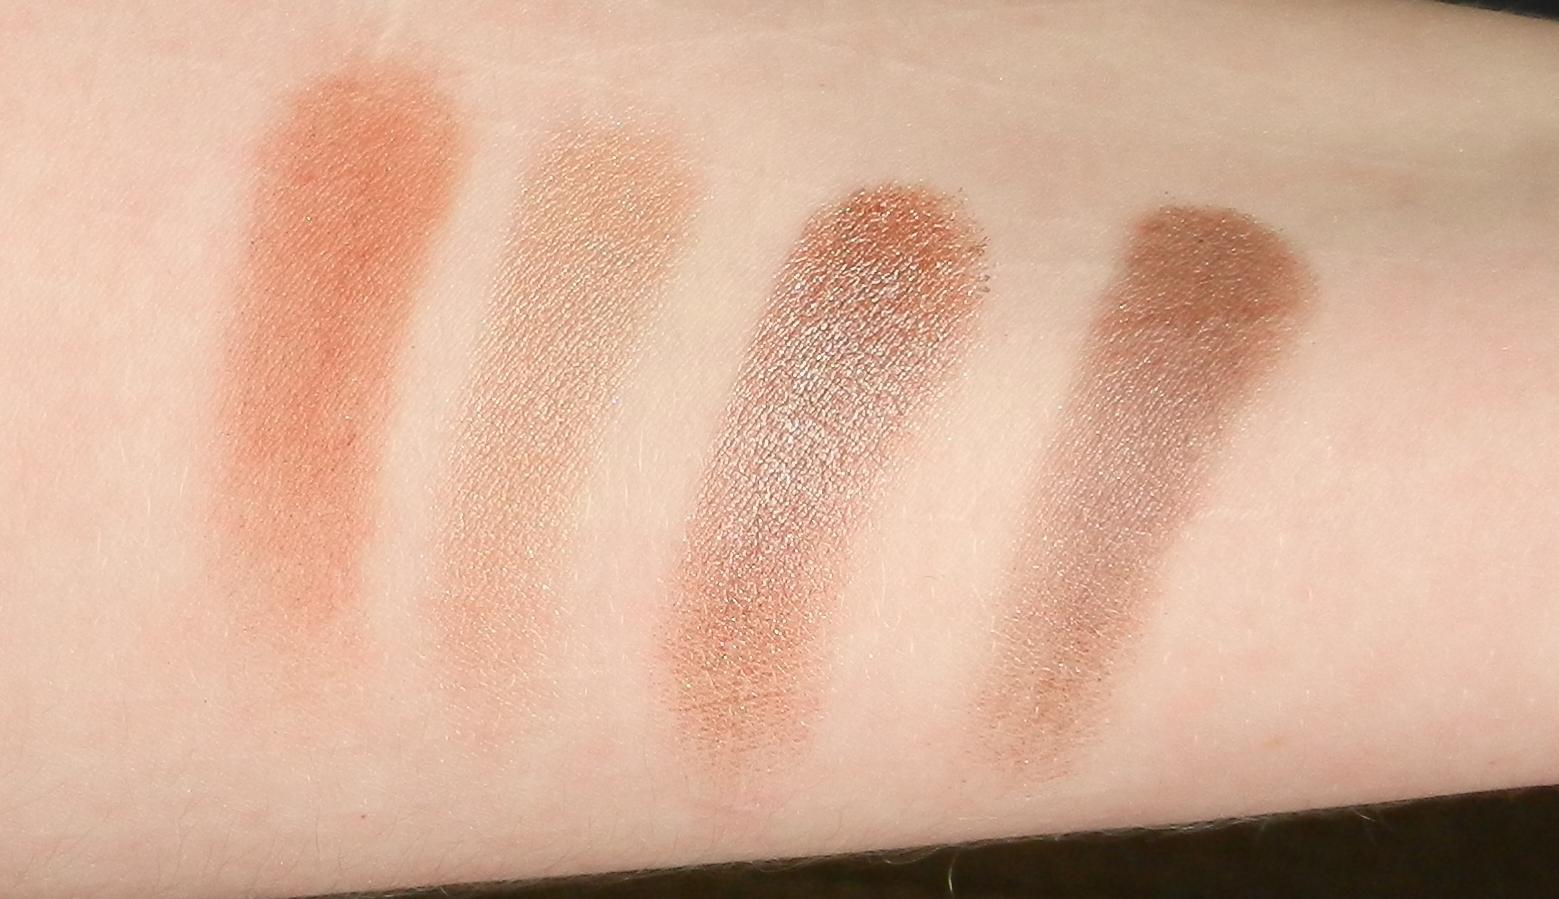 Natasha Denona Palette 28 Blue Swatches 70P Cool Plum, 75P Satin Skin, 40M Lavender Gray, 32P Deep Slate Gray